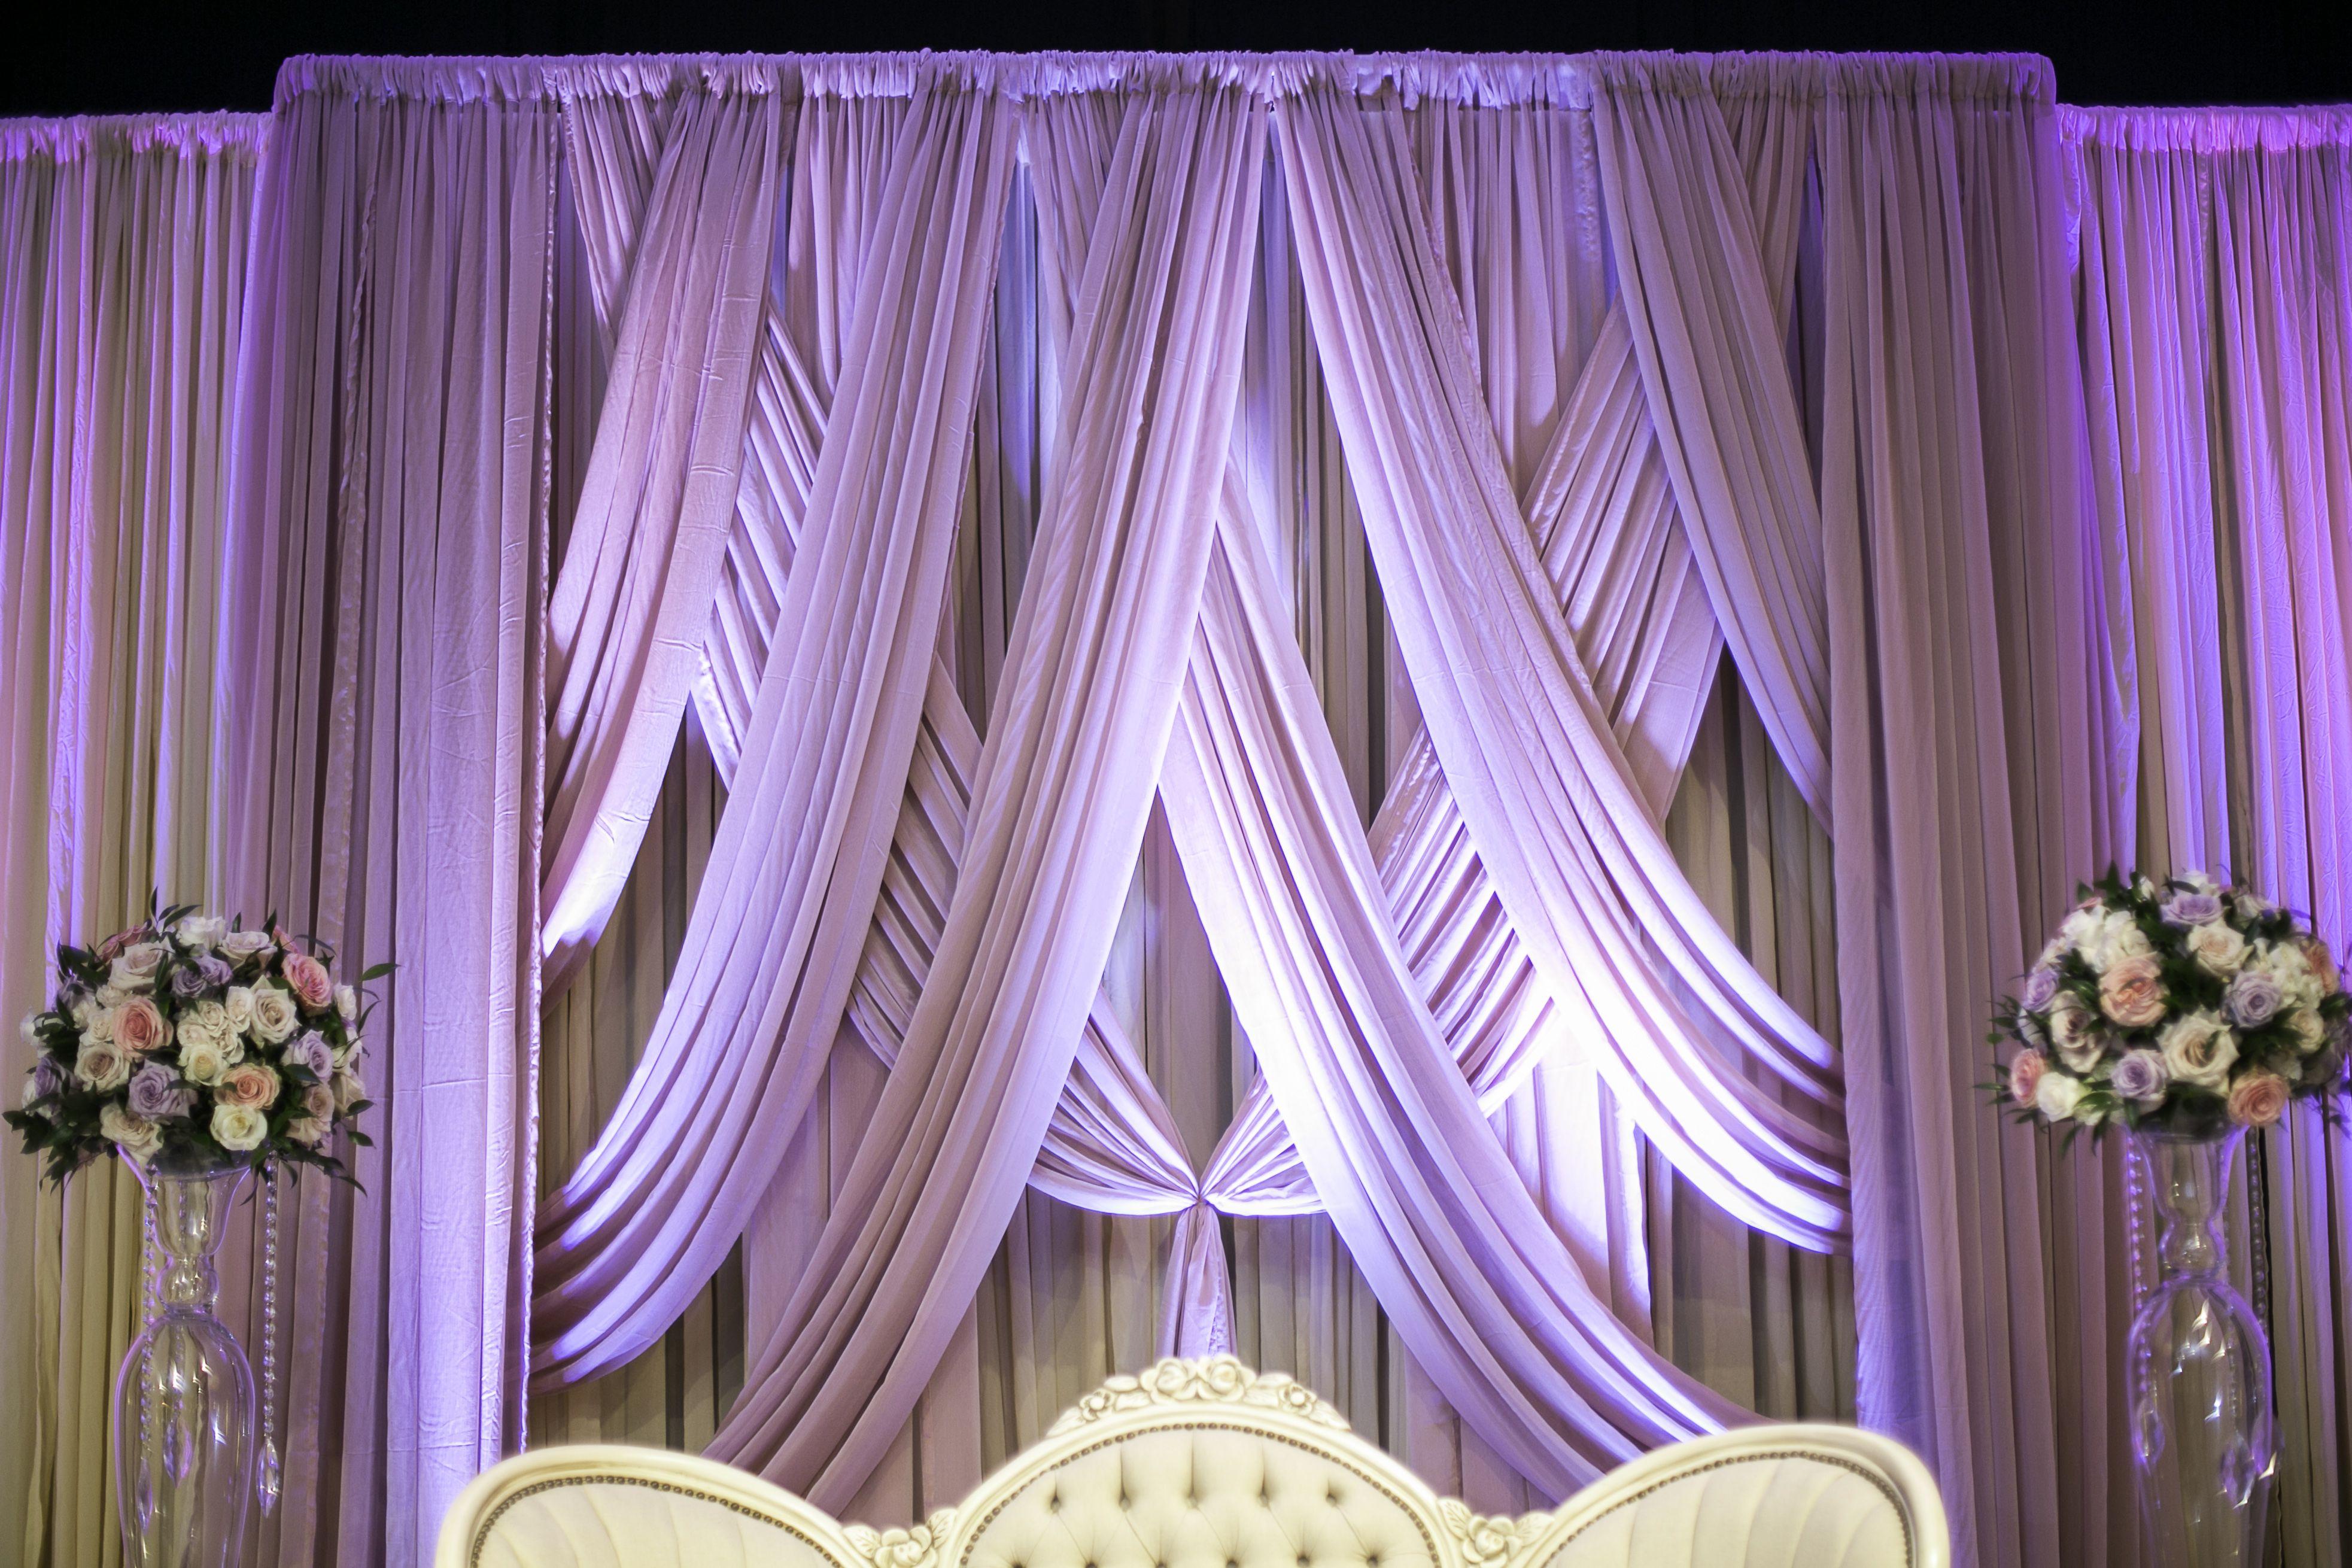 Intricate dusty rose draping sarahkhaneventstyling skes for Licenciatura en decoracion de interiores